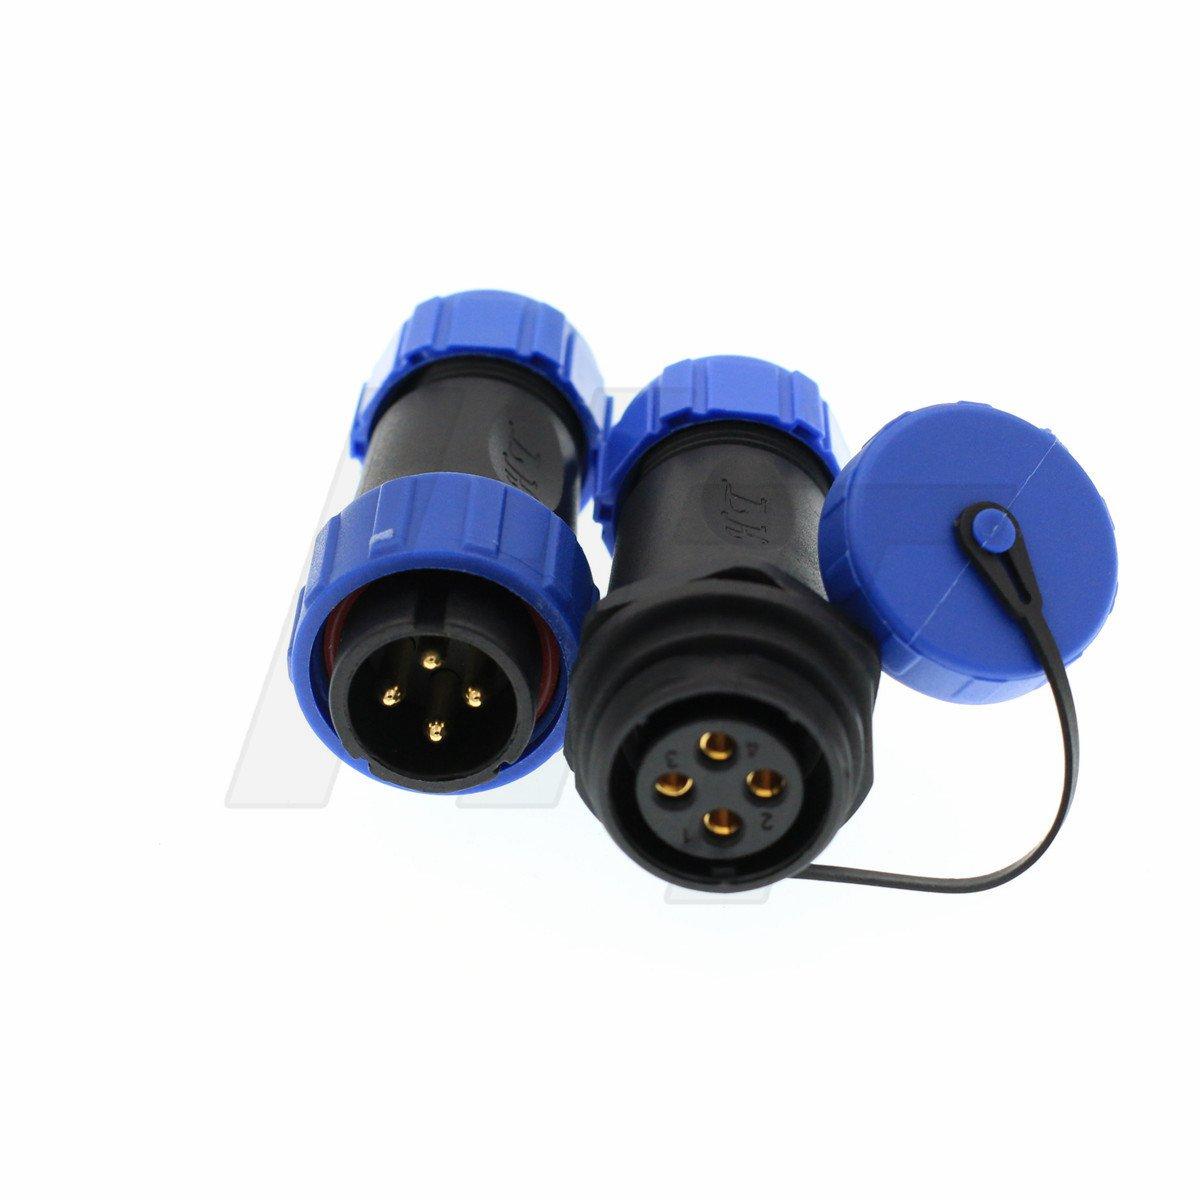 HangTon HE17 4 Pin Connector Male Female Power Plug Outdoor Plastic IP68 Waterproof Aviation